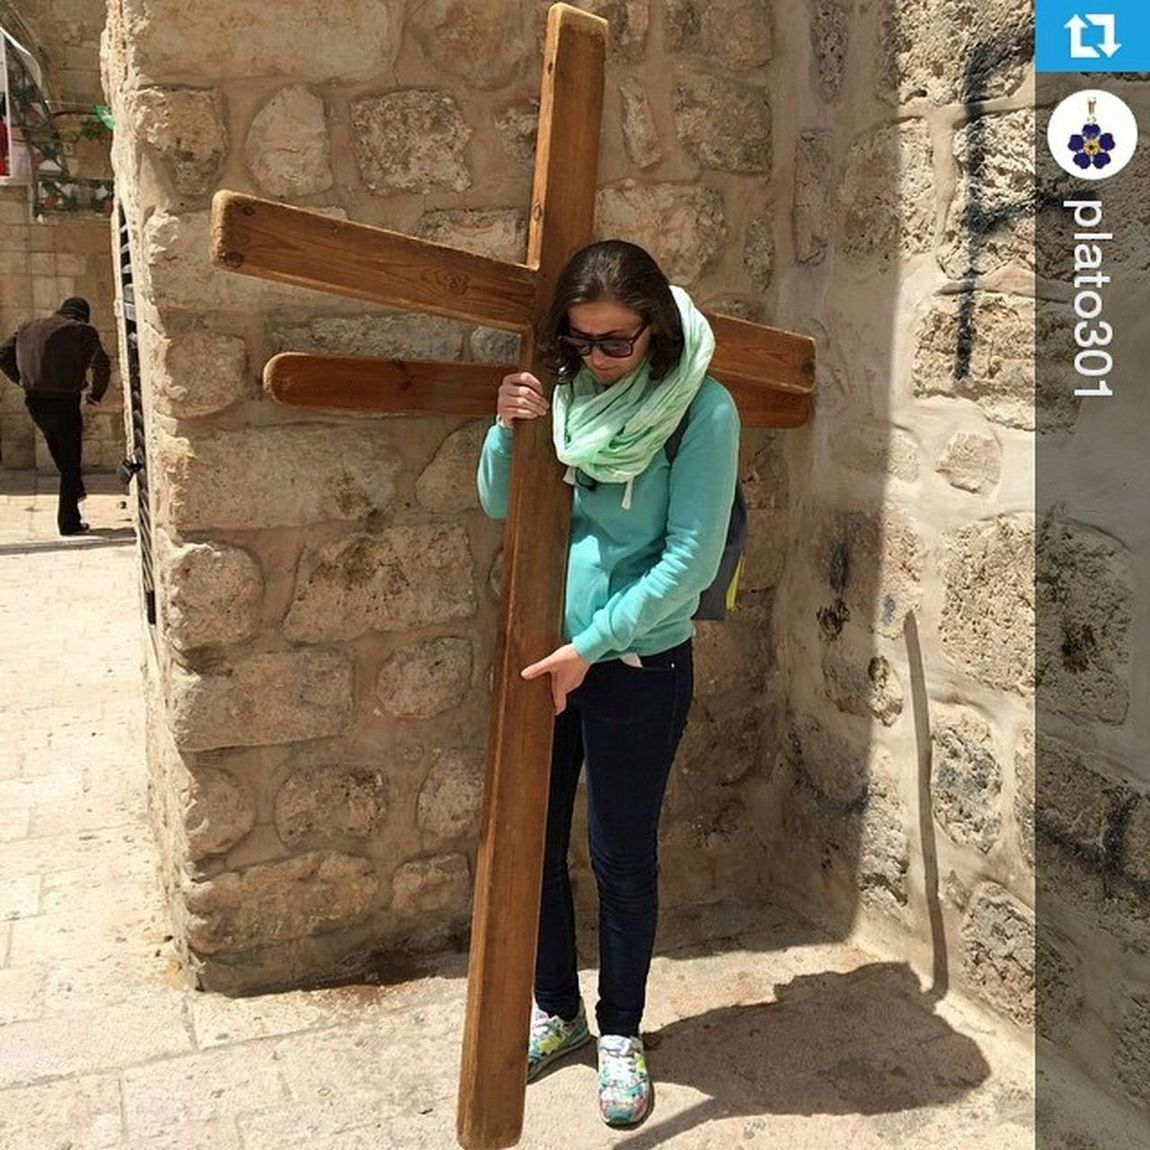 Repost @plato301 ・・・ ViaDolorosa Jerusalem Holyland cross 2015